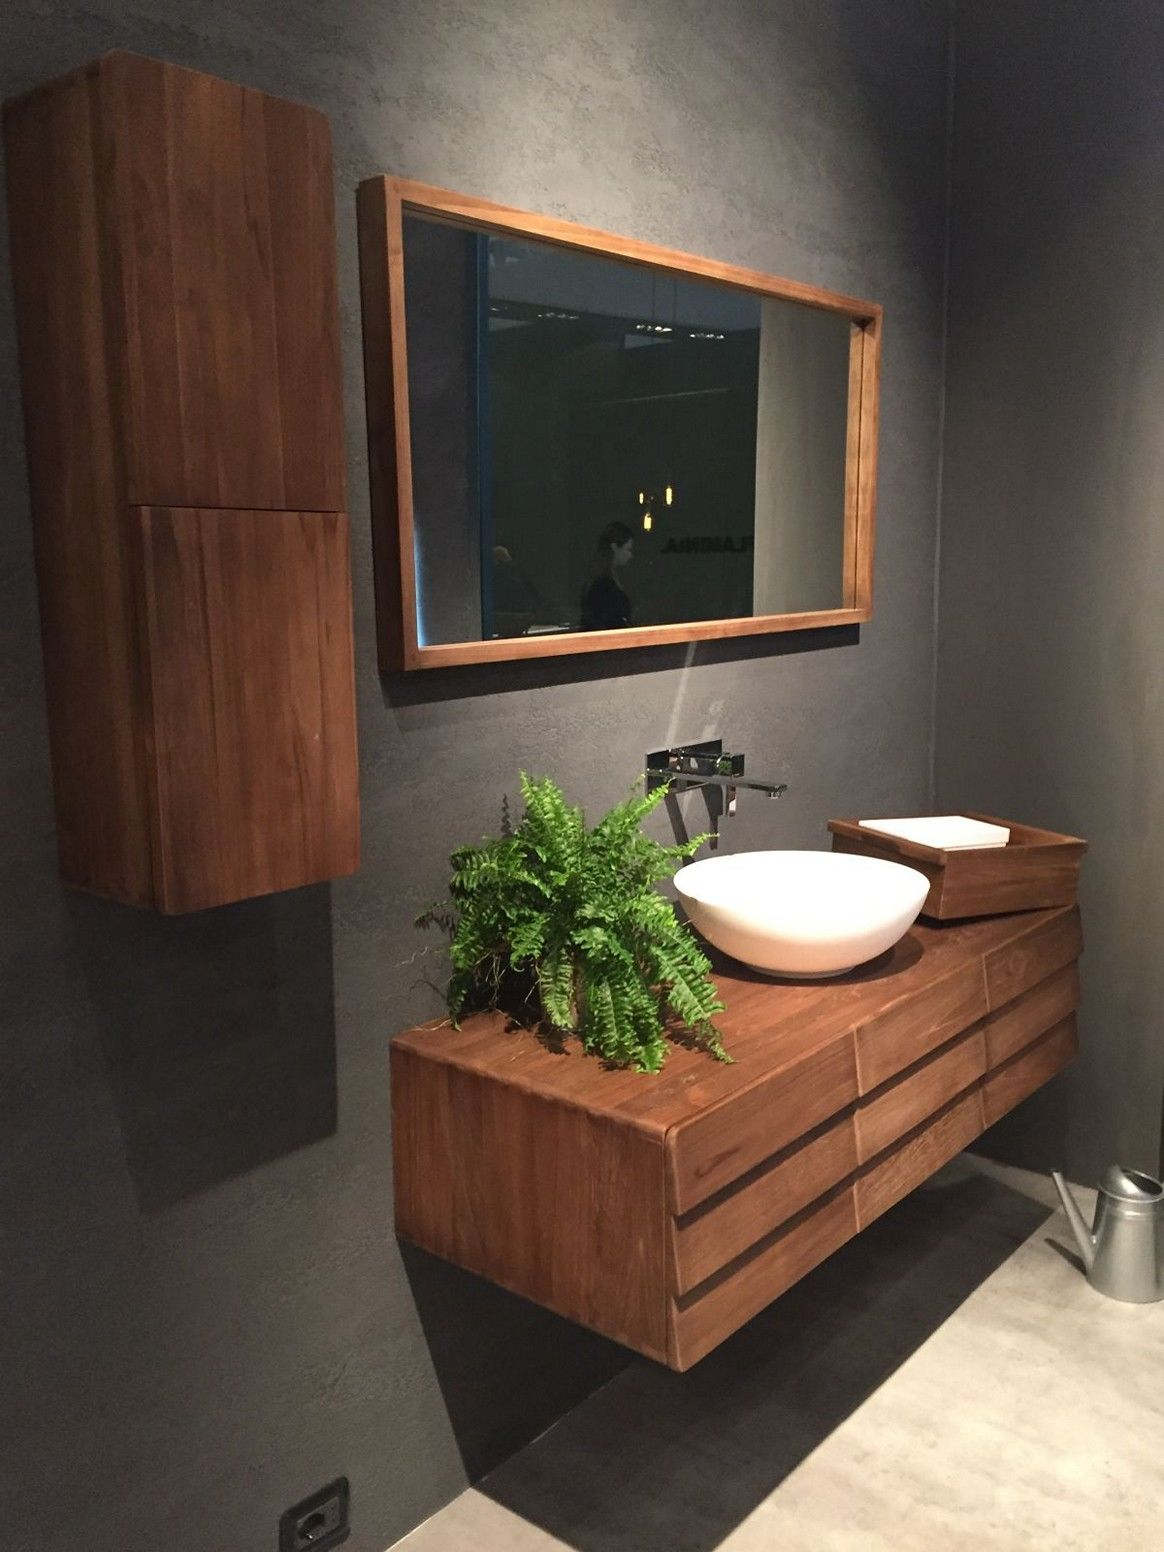 Modern Bathroom By Desai Chia Architecture By: Unique Mid Century Modern Bathroom Vanity Wallpaper